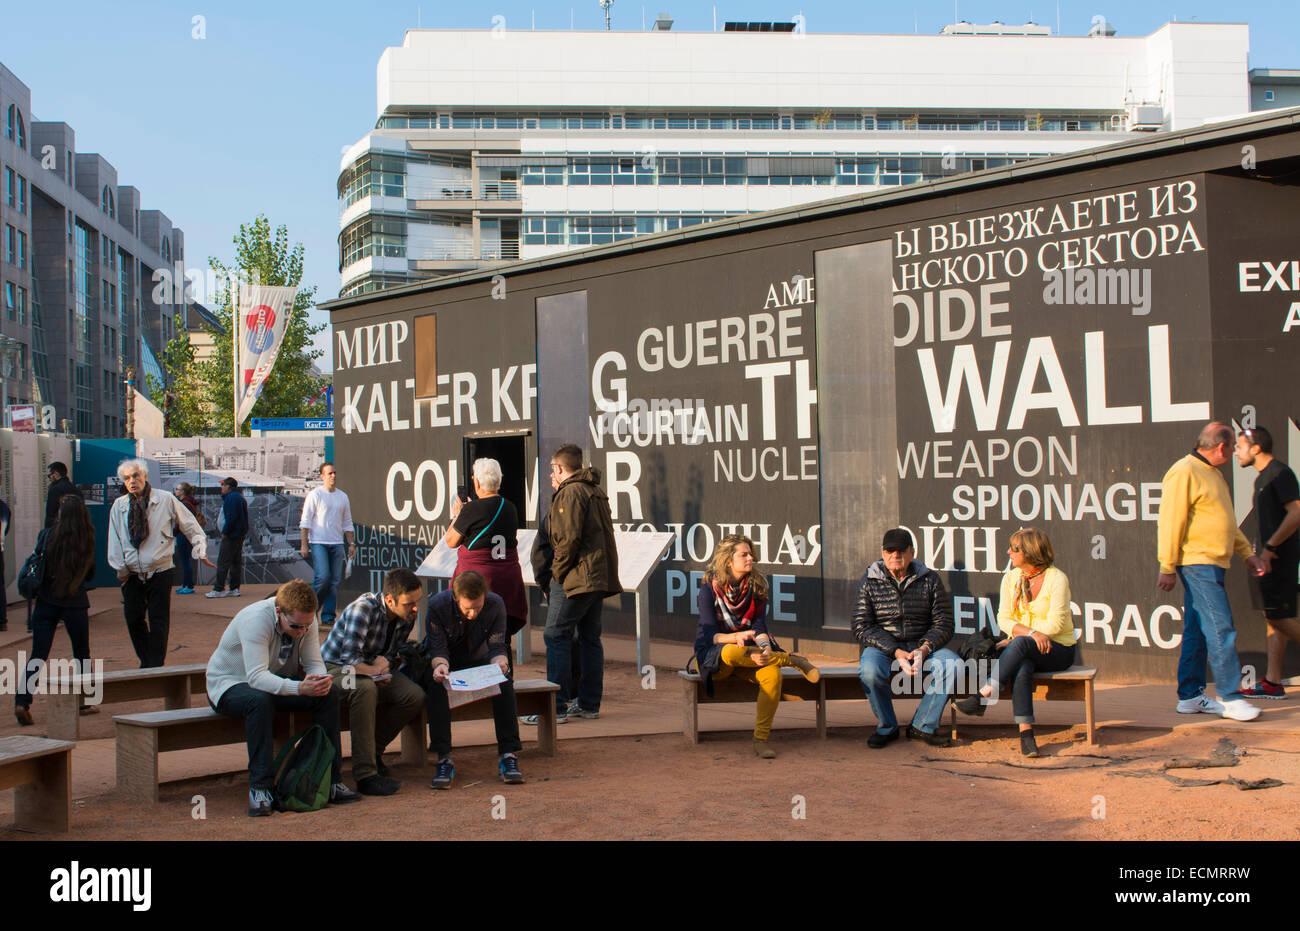 Berlín Alemania Museo Checkpoint Charlie trozos del Muro de Berlín turistas miedo tristeza histórica Imagen De Stock